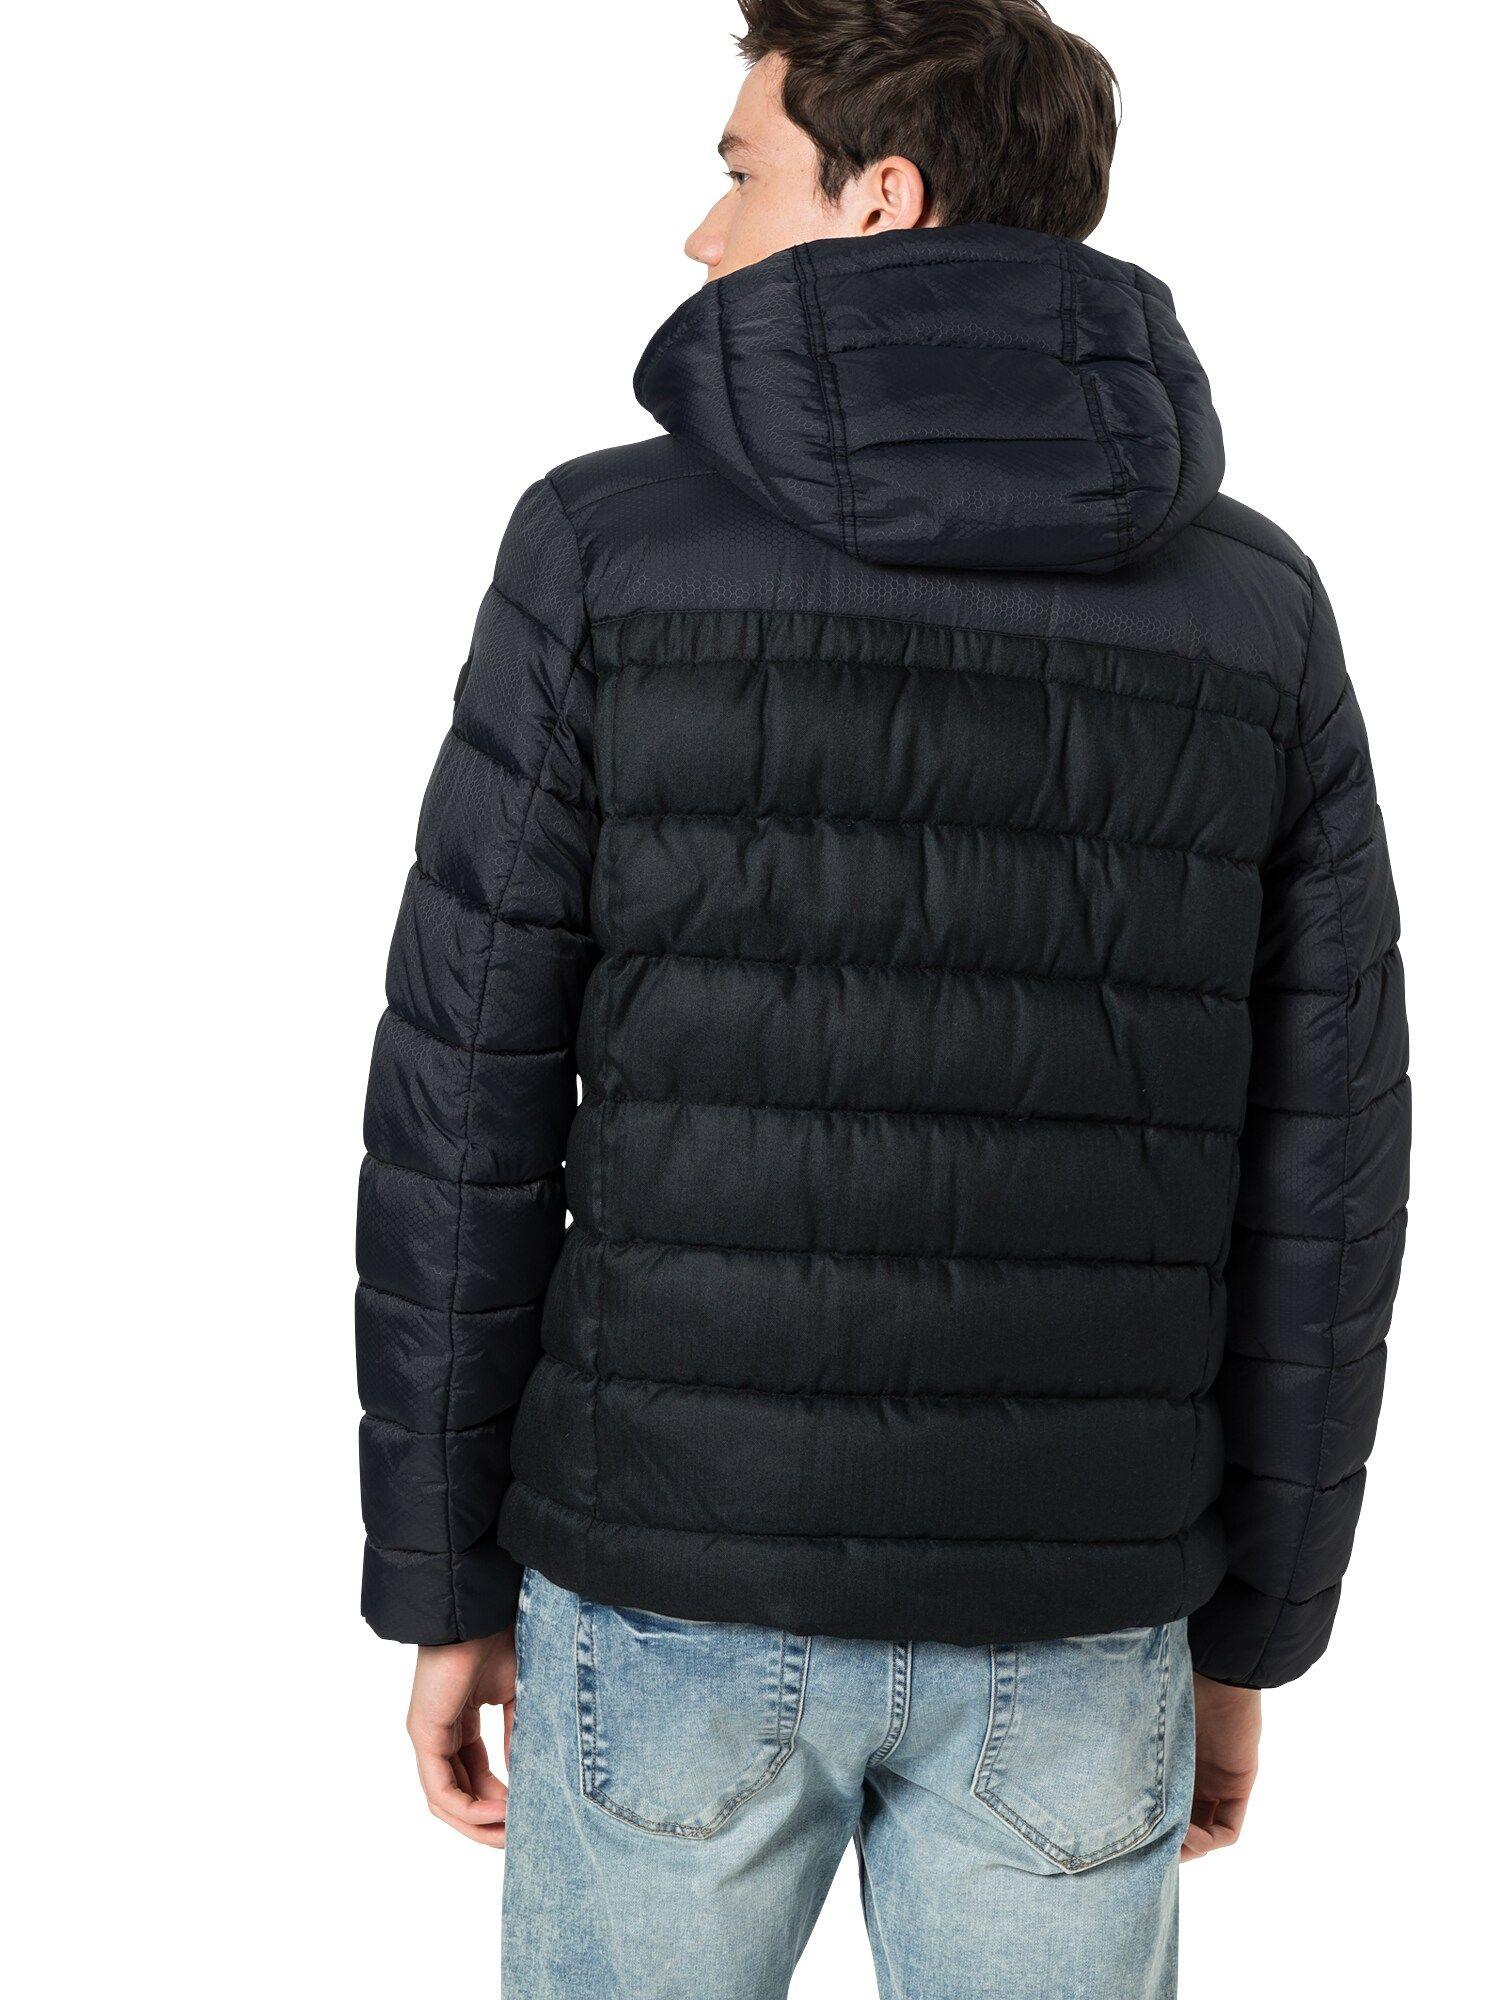 S Oliver Steppjacke Outdoor Jacke Herren Schwarz Grosse M Outdoor Jacken Herren Jacken Und Steppjacke